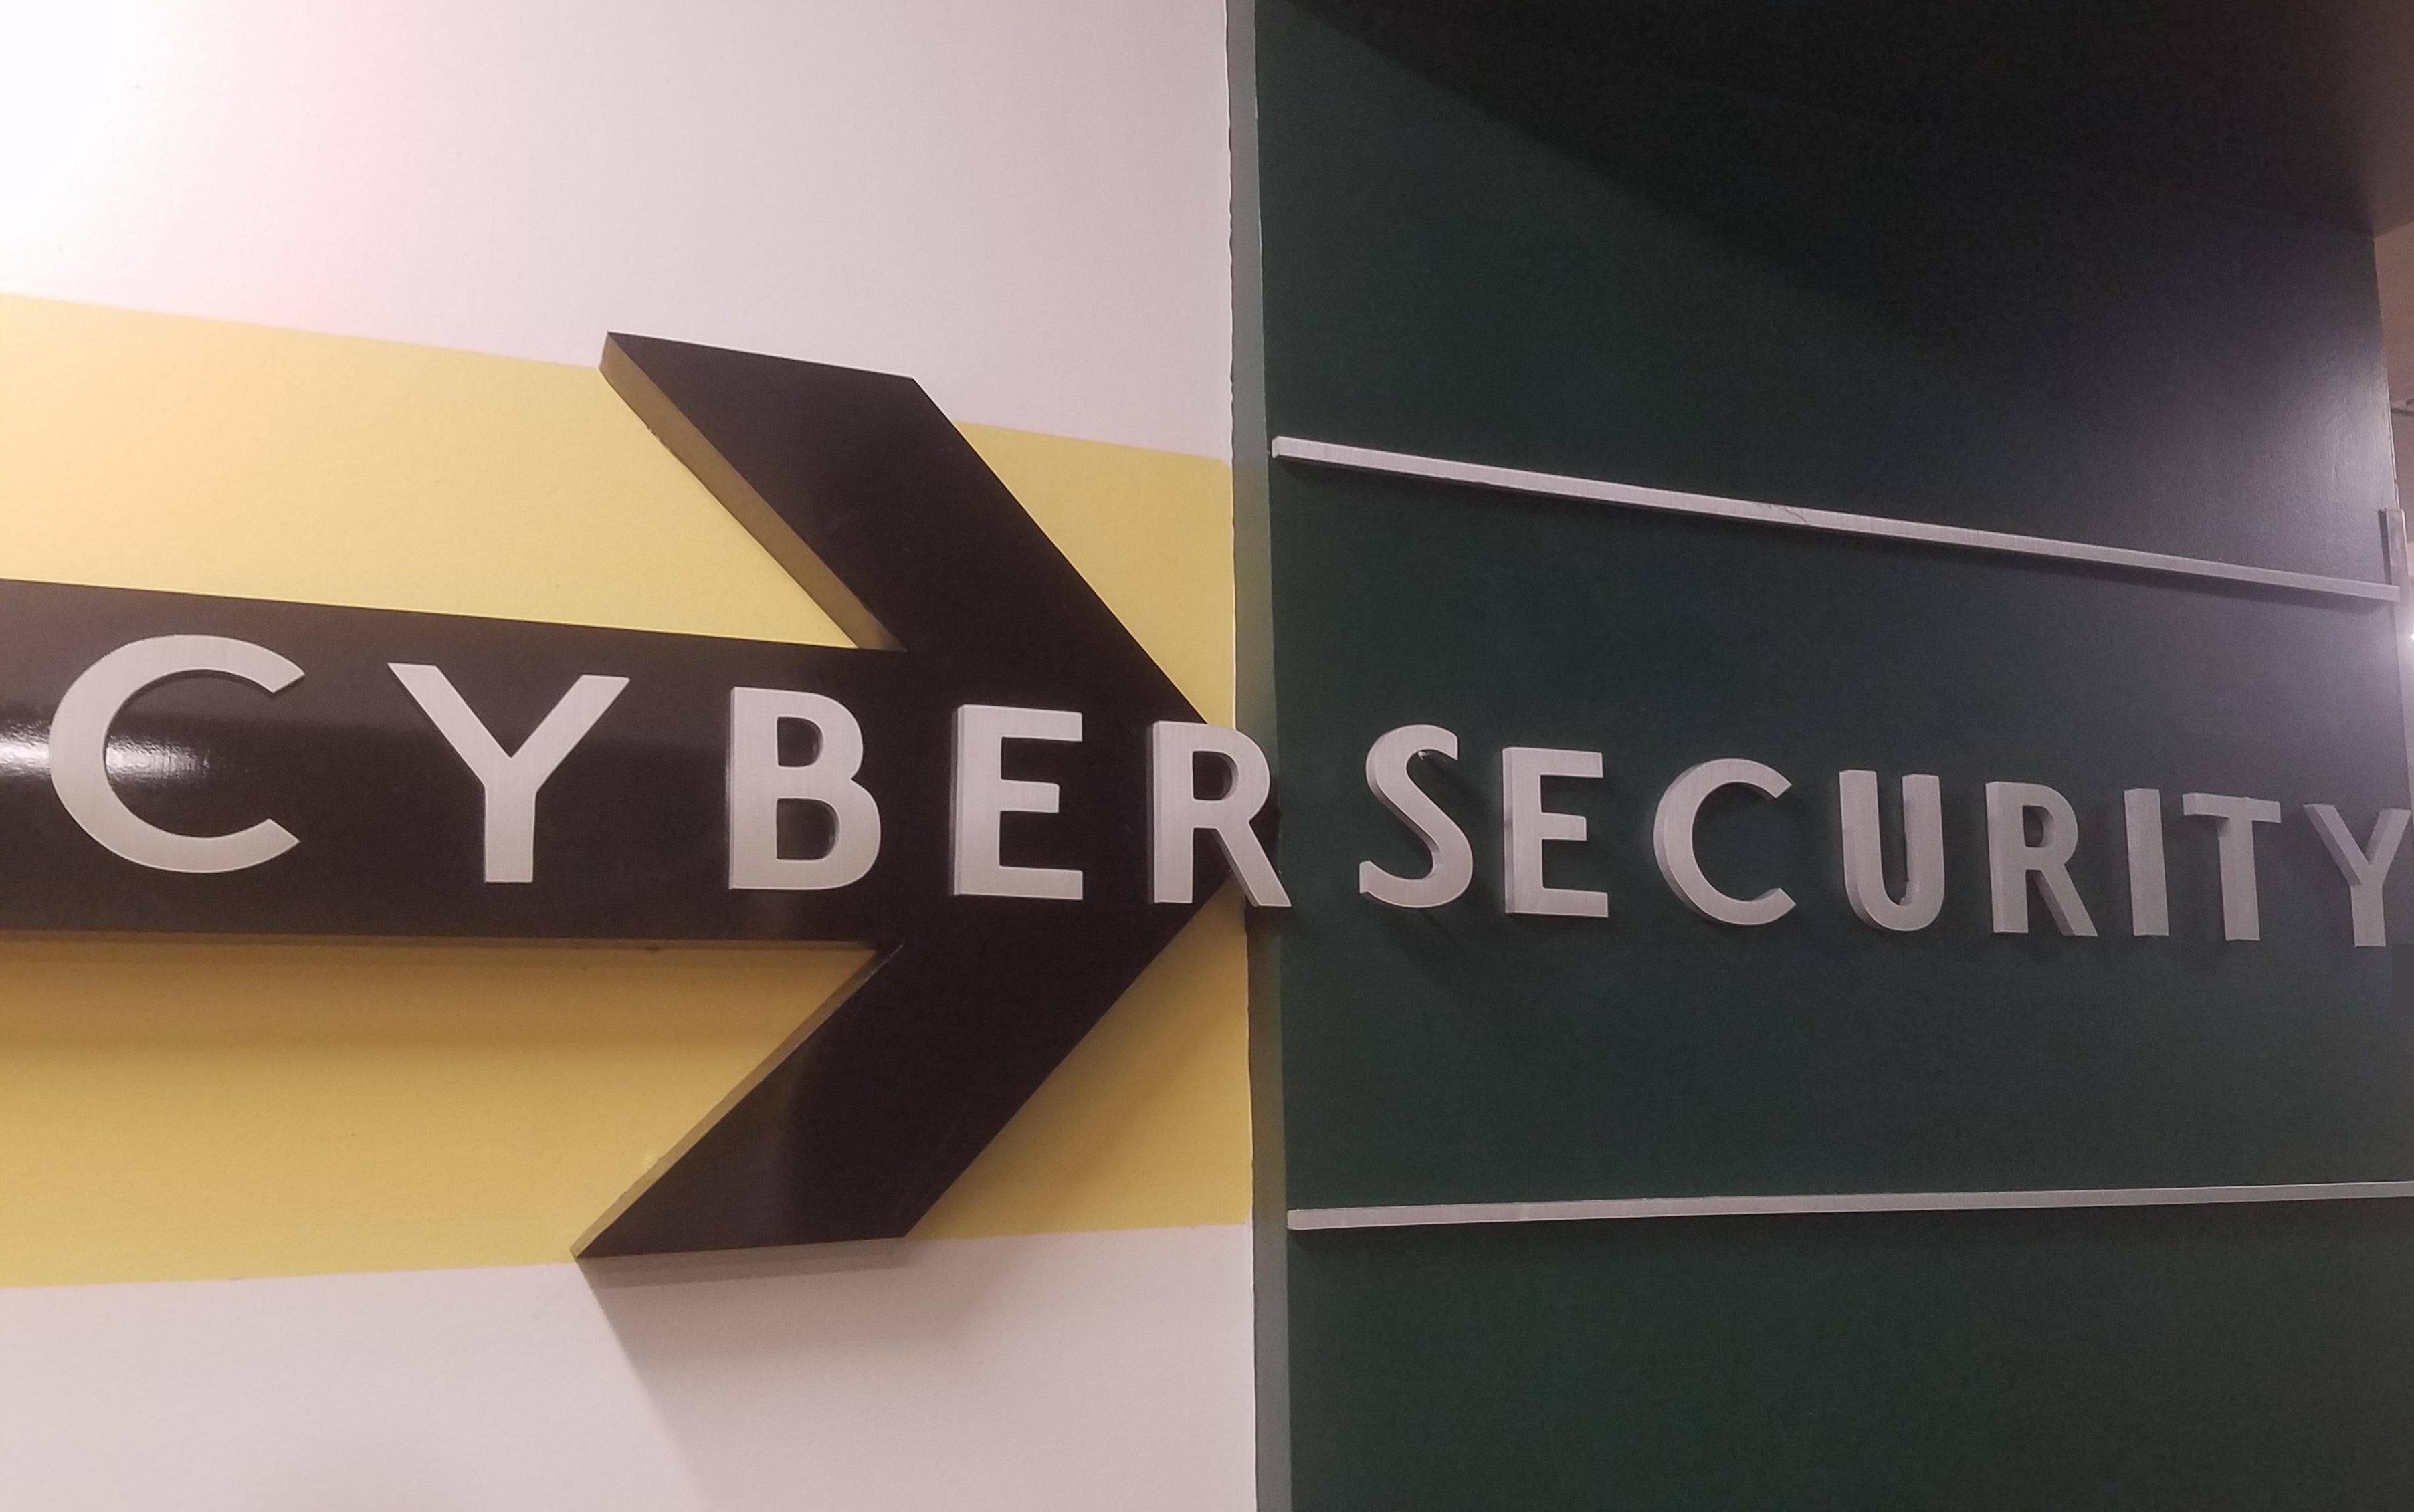 cybersecurity NSU logo